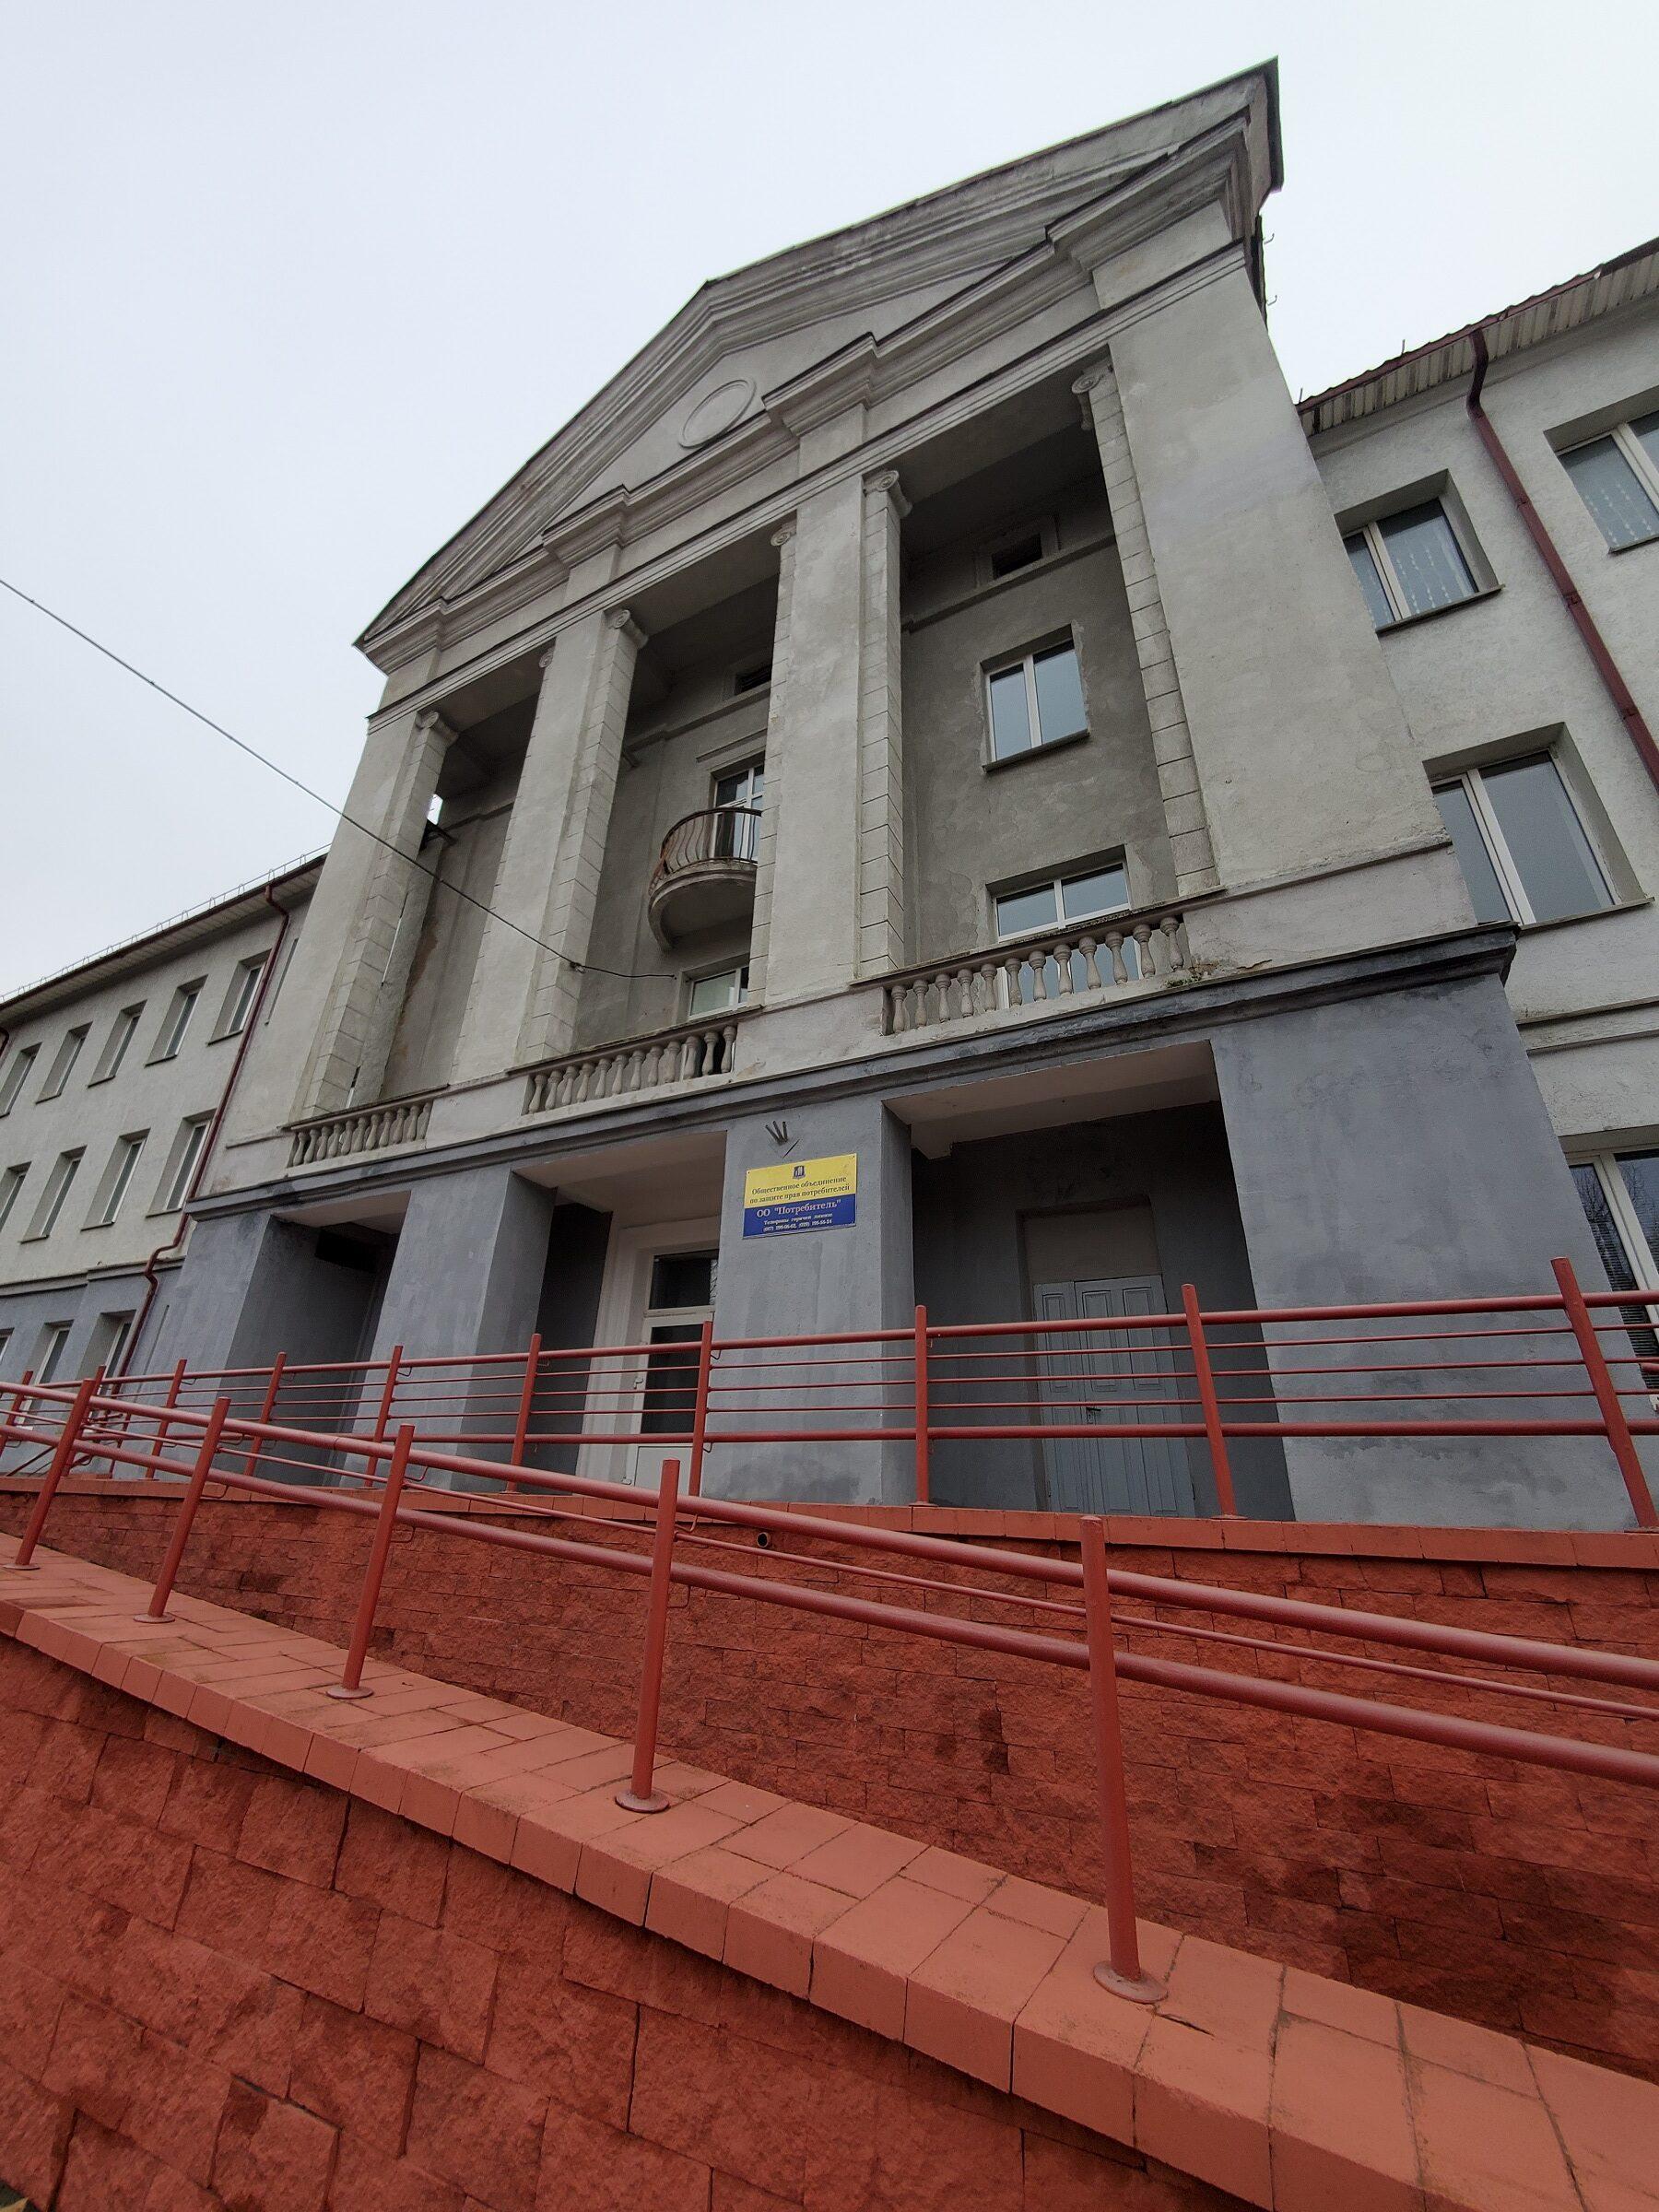 20201107 150426 1 rotated - Минск. Тракторозаводской поселок